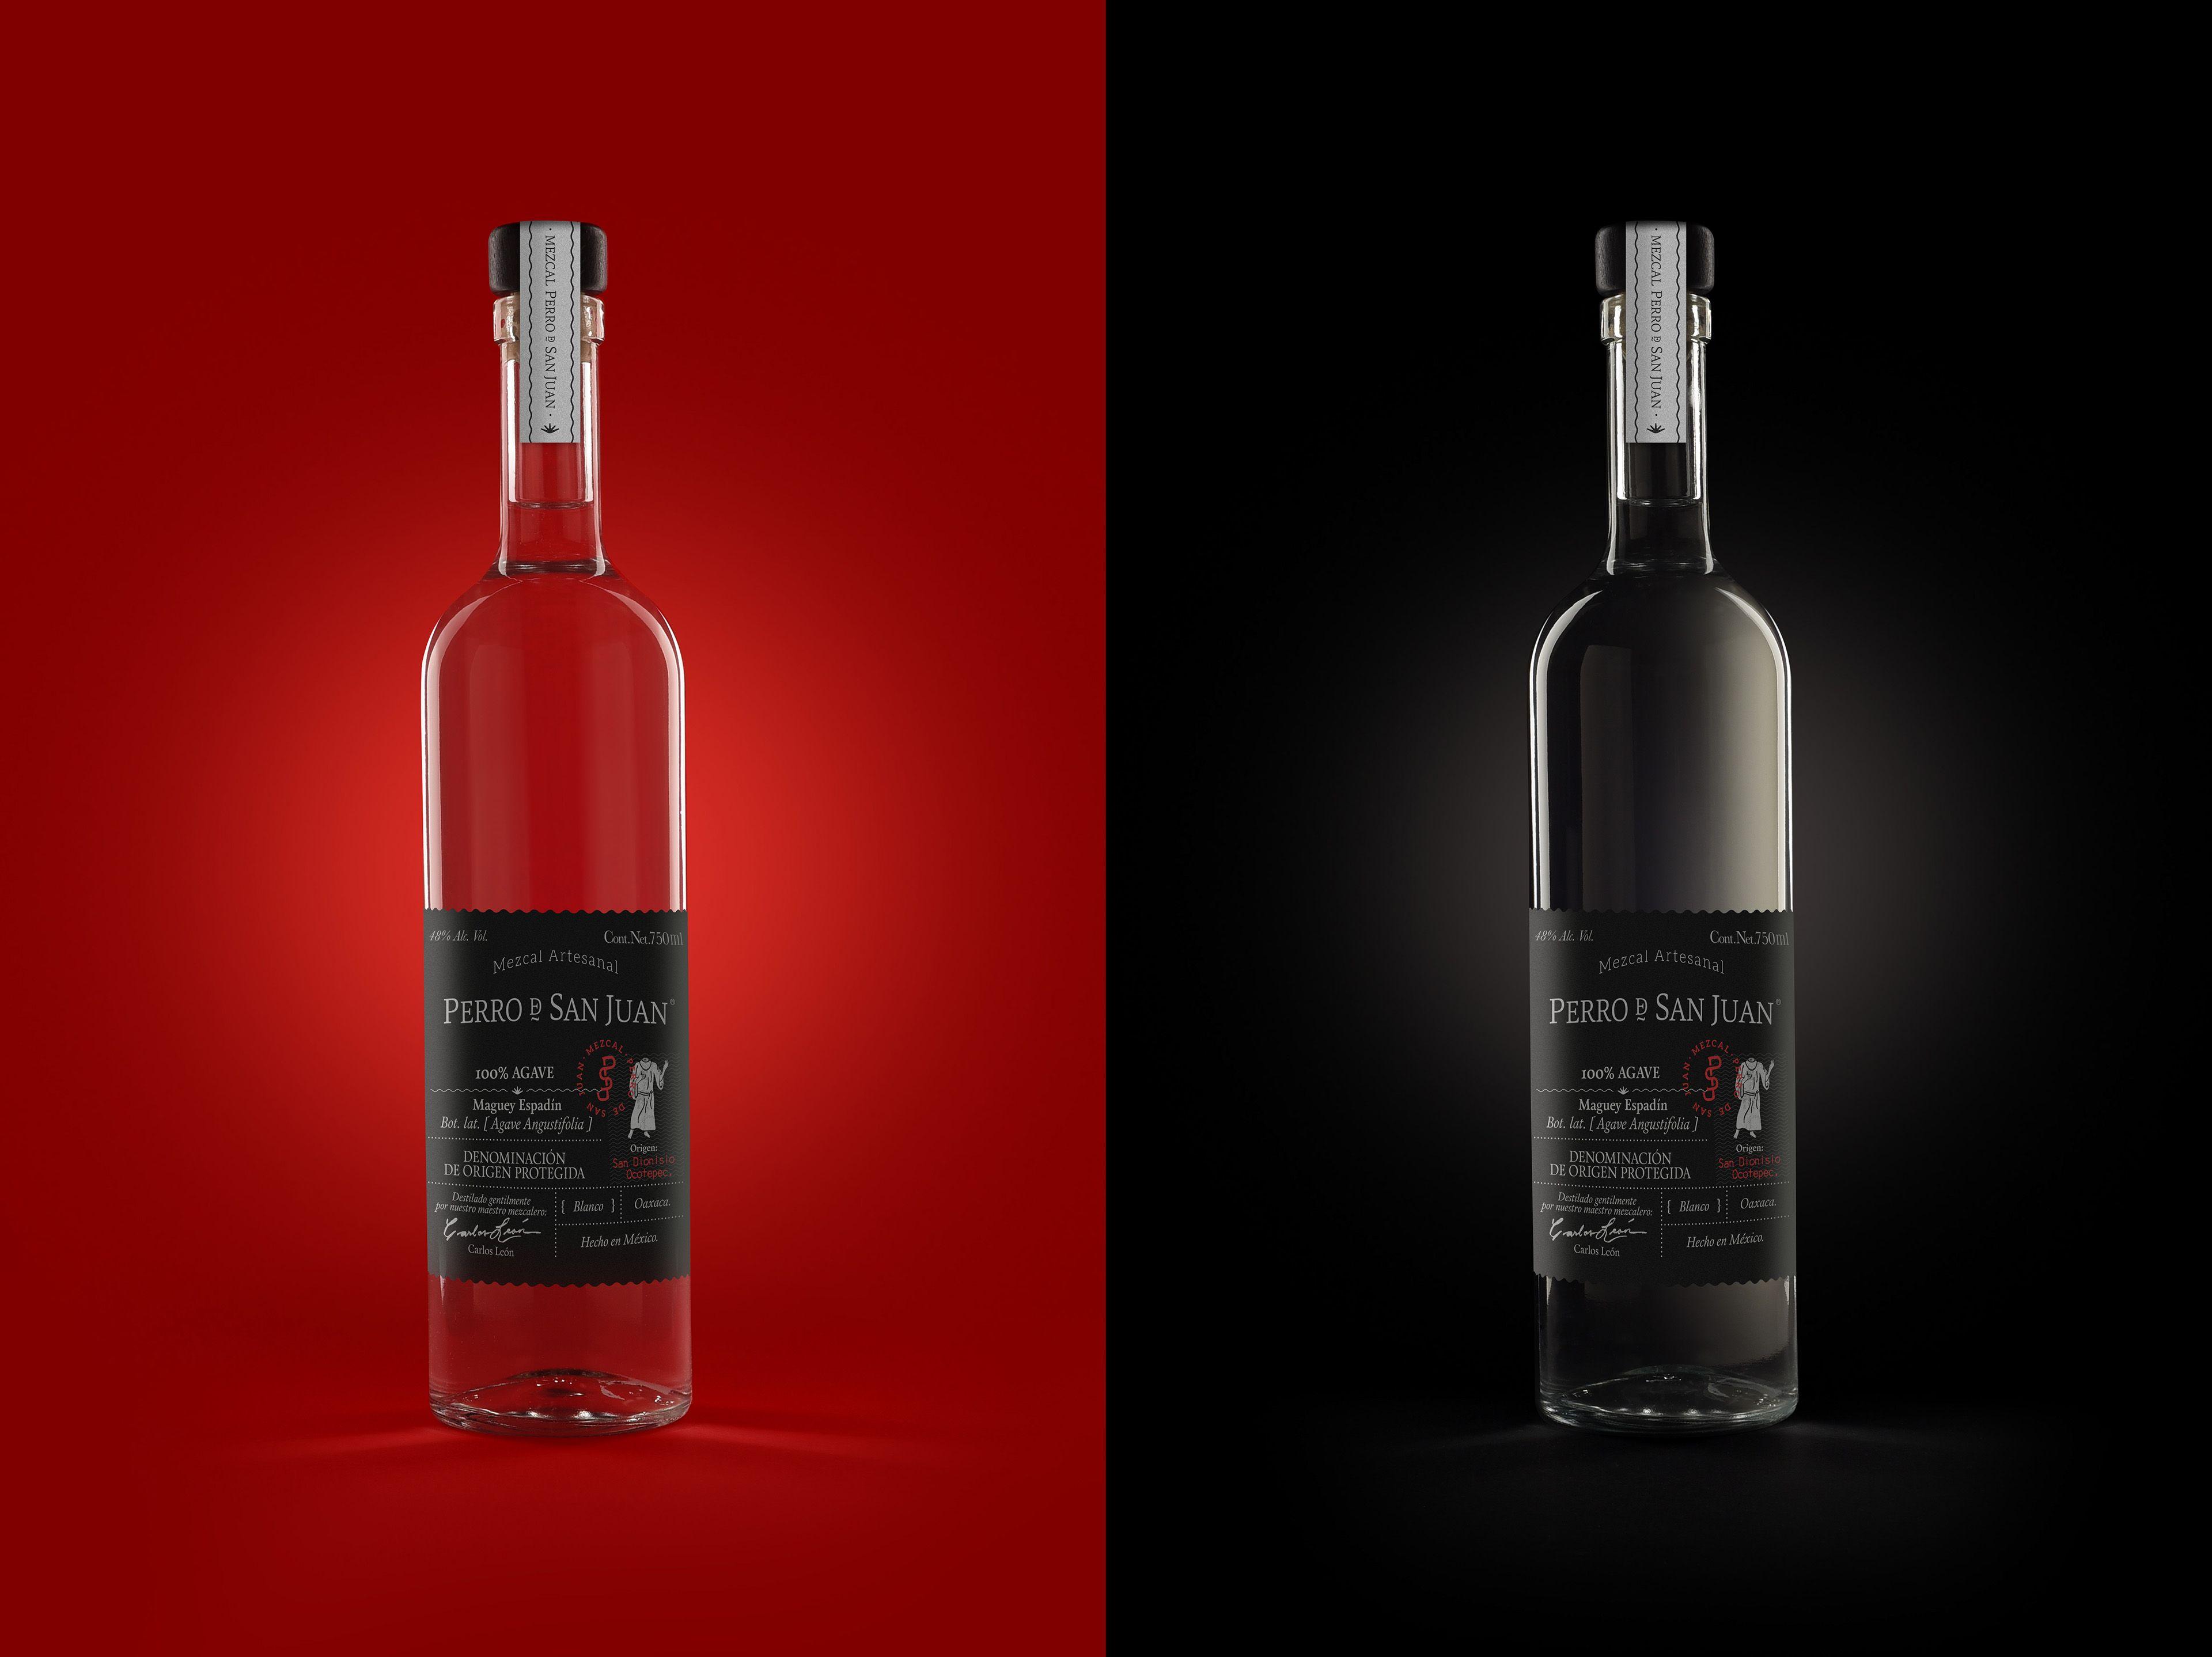 Perro De San Juan Mezcal Wine Bottle Vodka Bottle Rose Wine Bottle